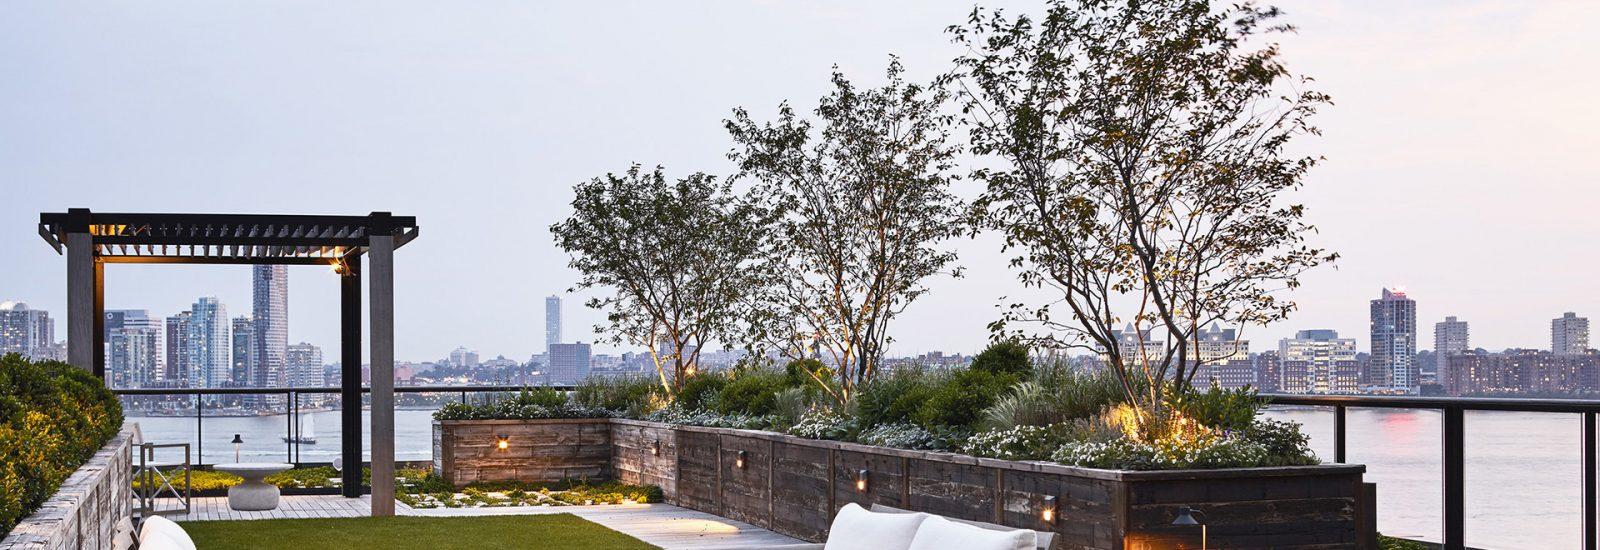 New York City roof garden